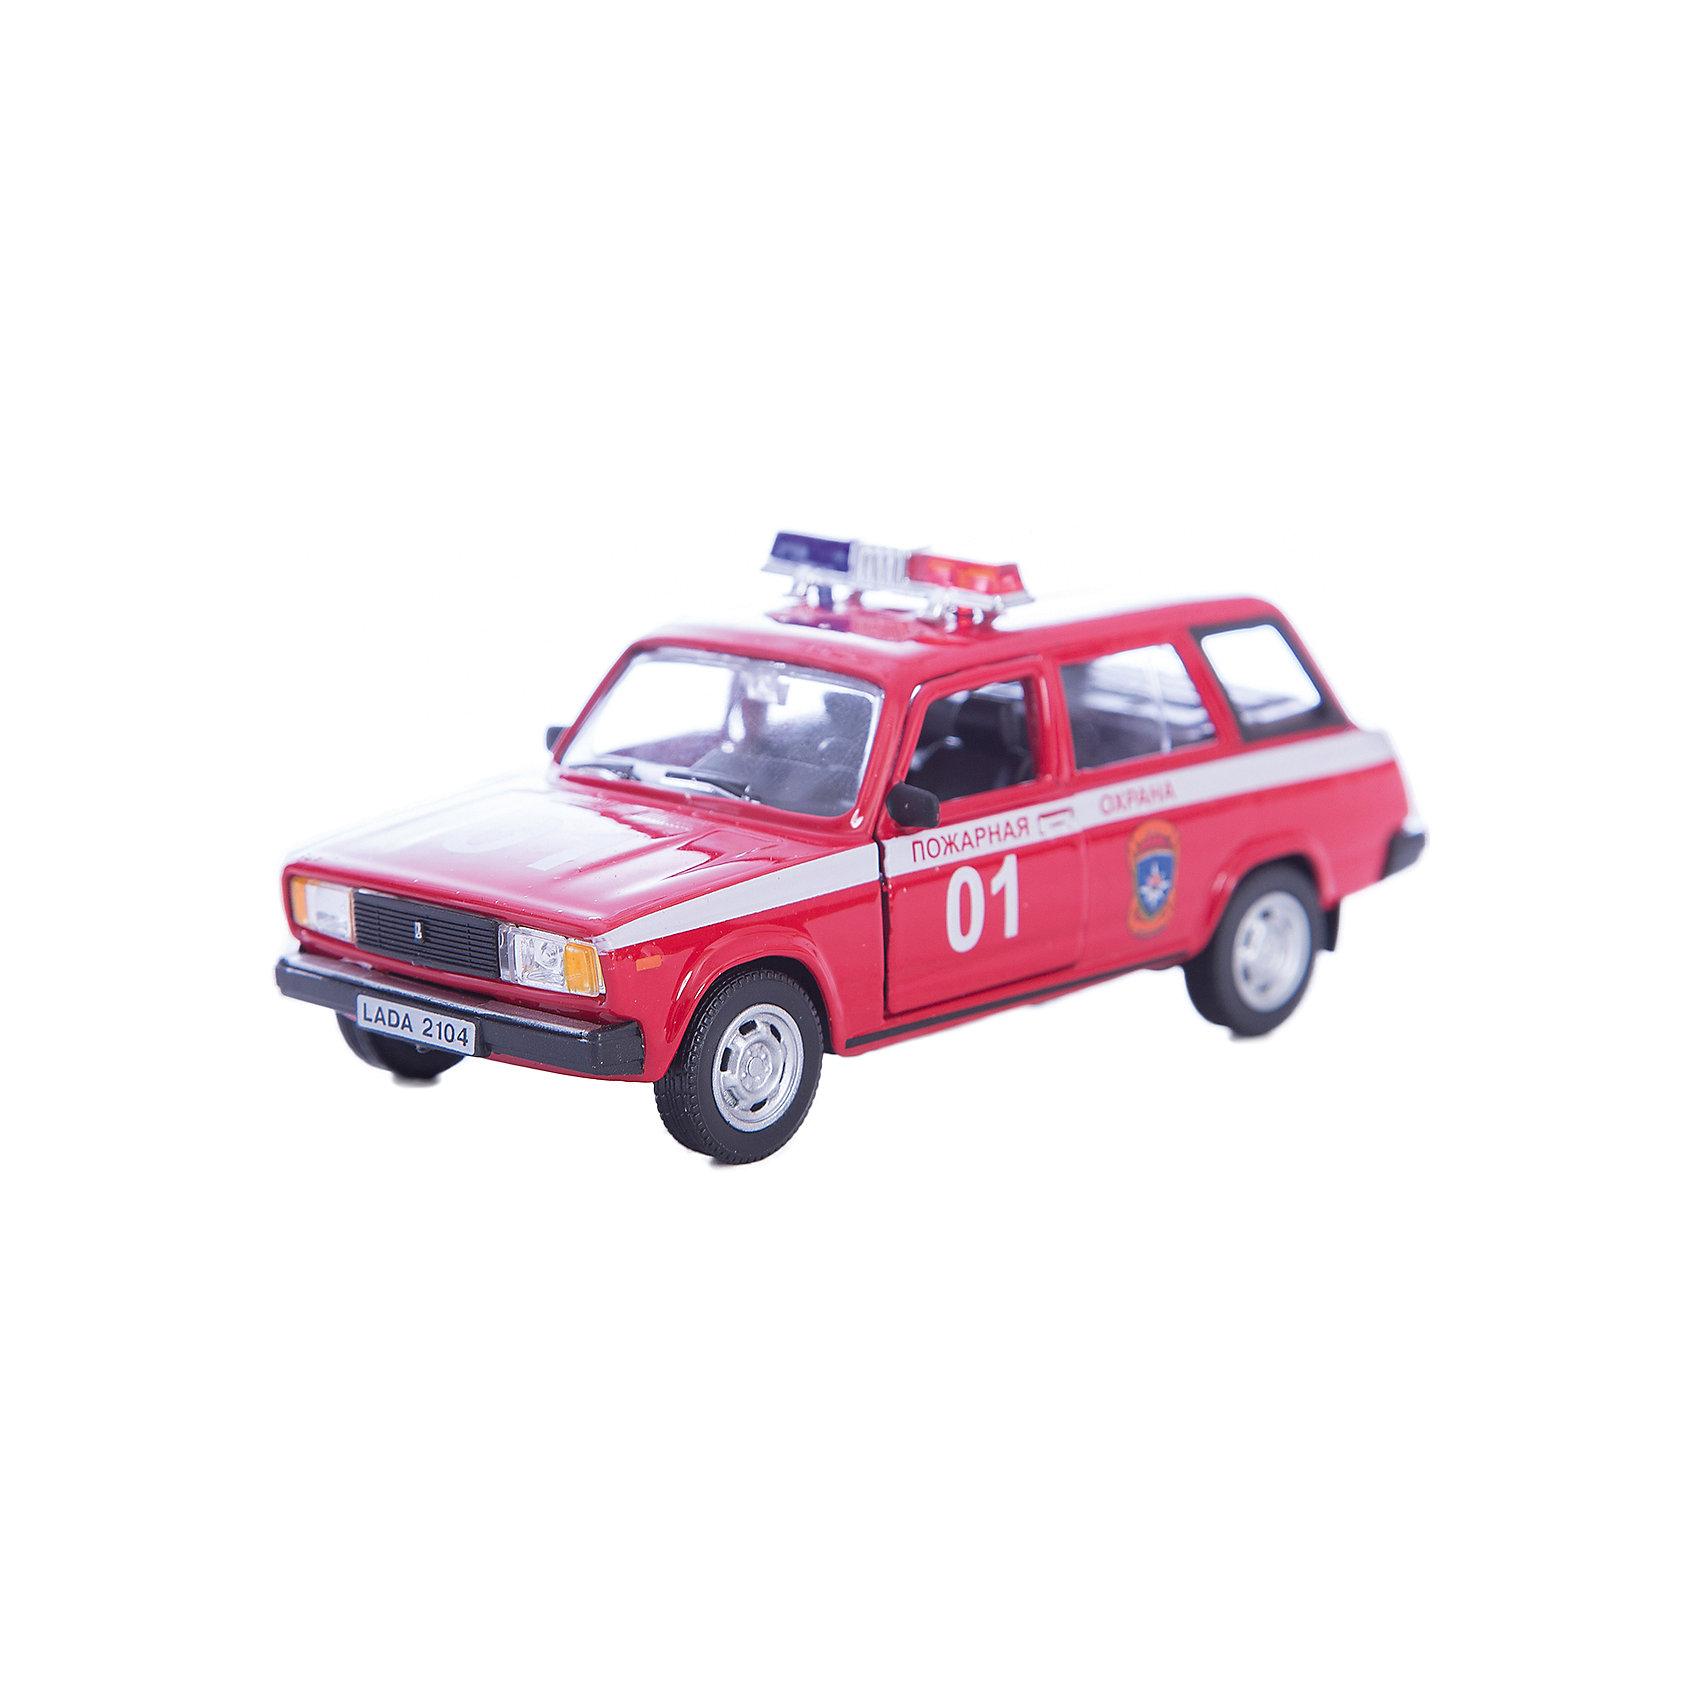 Машинка Lada 2104 пожарная охрана 1:36, AutotimeМашинки<br><br><br>Ширина мм: 165<br>Глубина мм: 57<br>Высота мм: 75<br>Вес г: 13<br>Возраст от месяцев: 36<br>Возраст до месяцев: 2147483647<br>Пол: Мужской<br>Возраст: Детский<br>SKU: 5583948